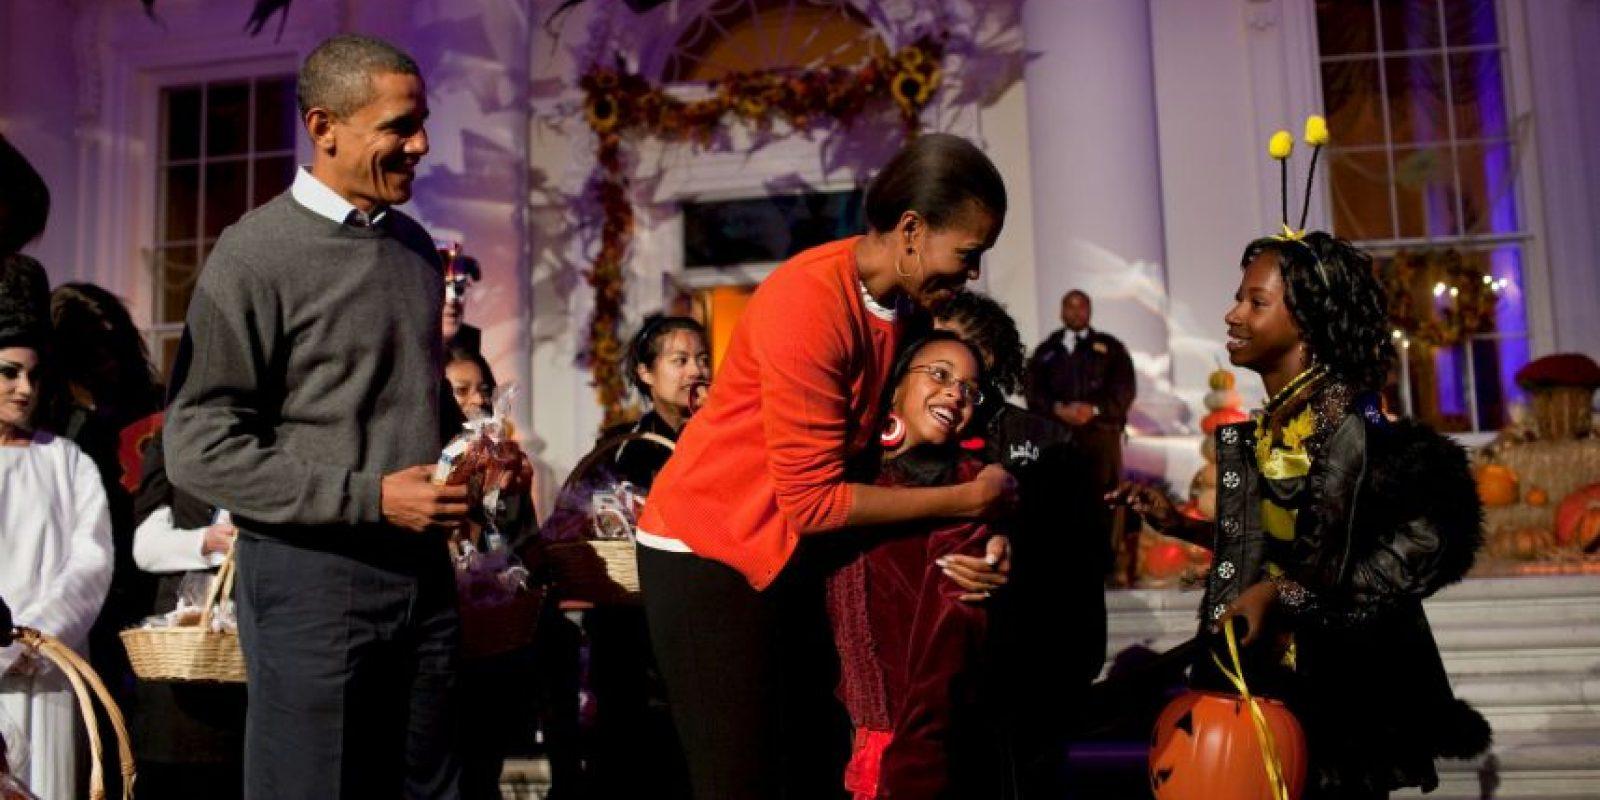 La familia Obama reparte dulces entre los visitantes Foto:Getty Images